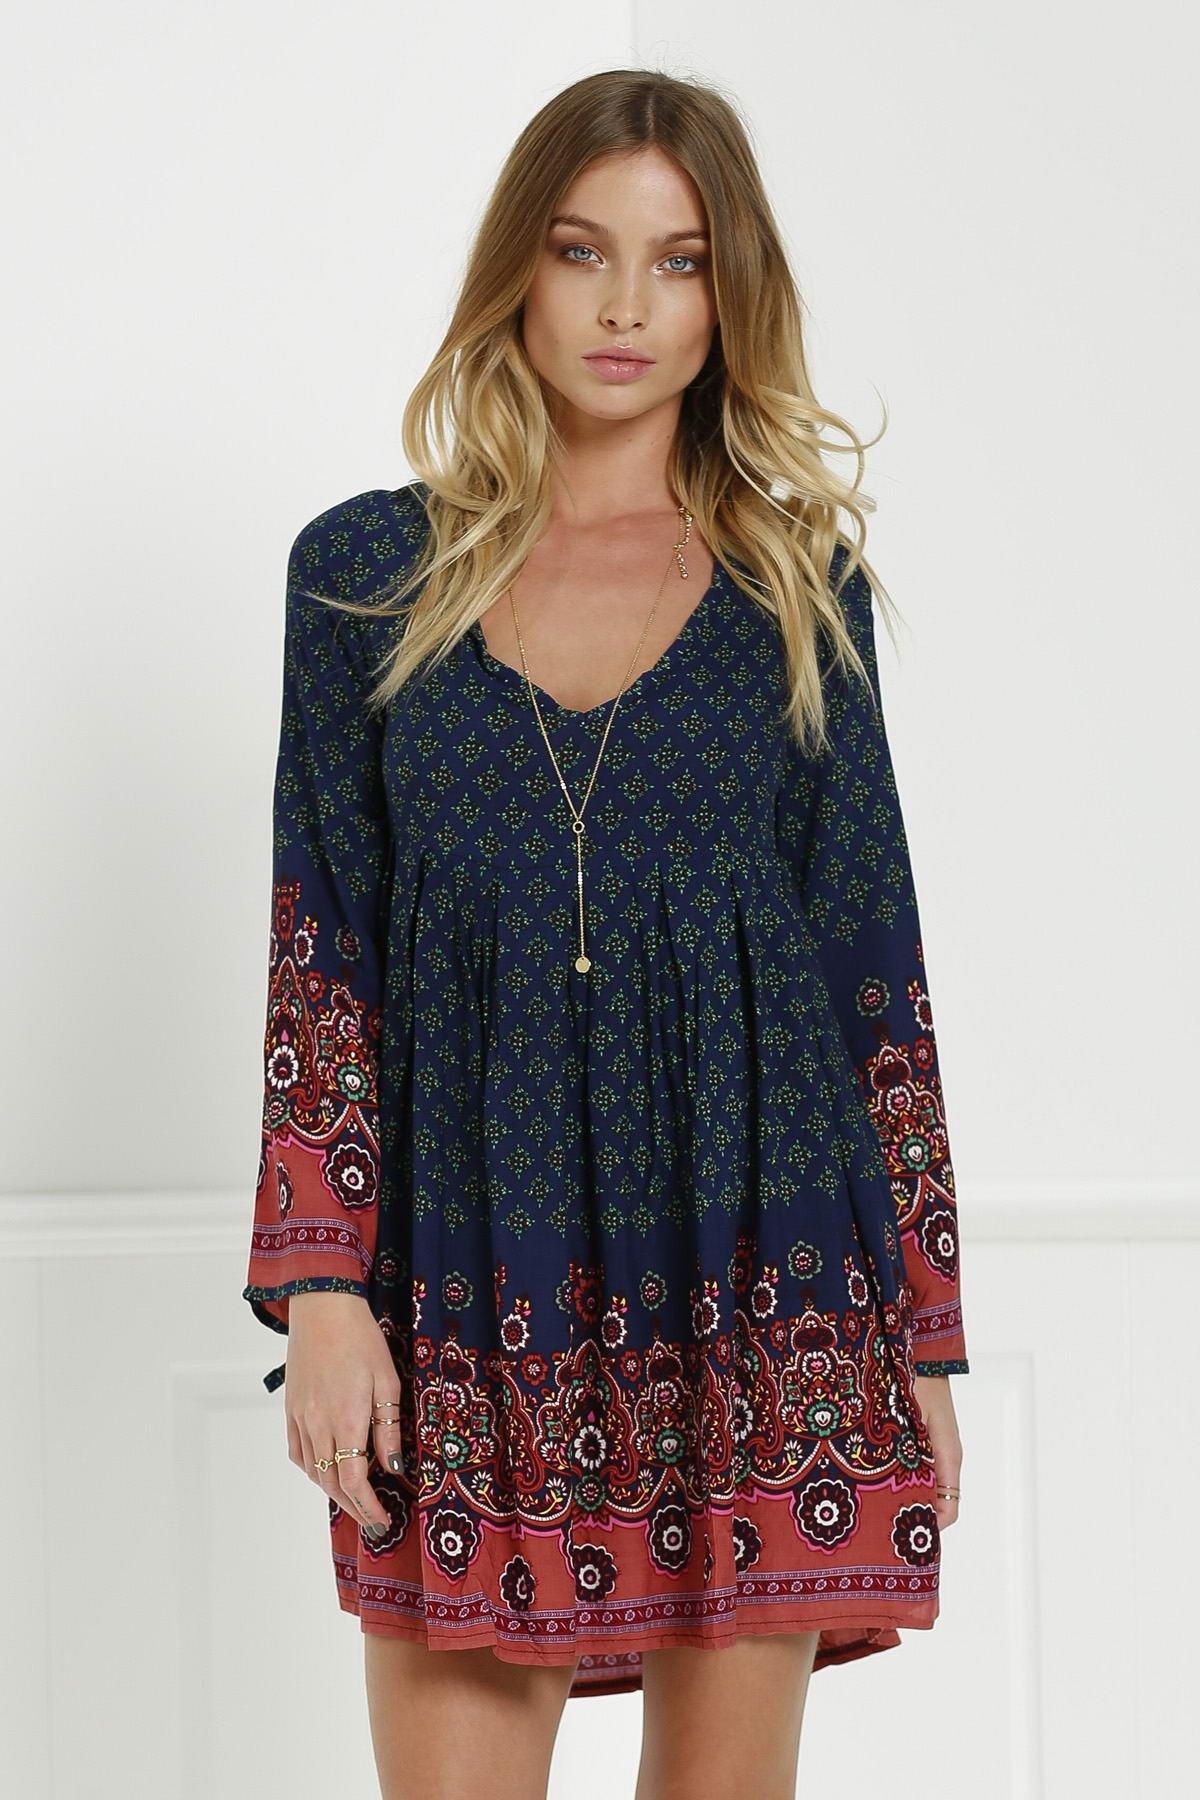 V-Neck 3/4 Sleeve Floral Print Tunic Dress